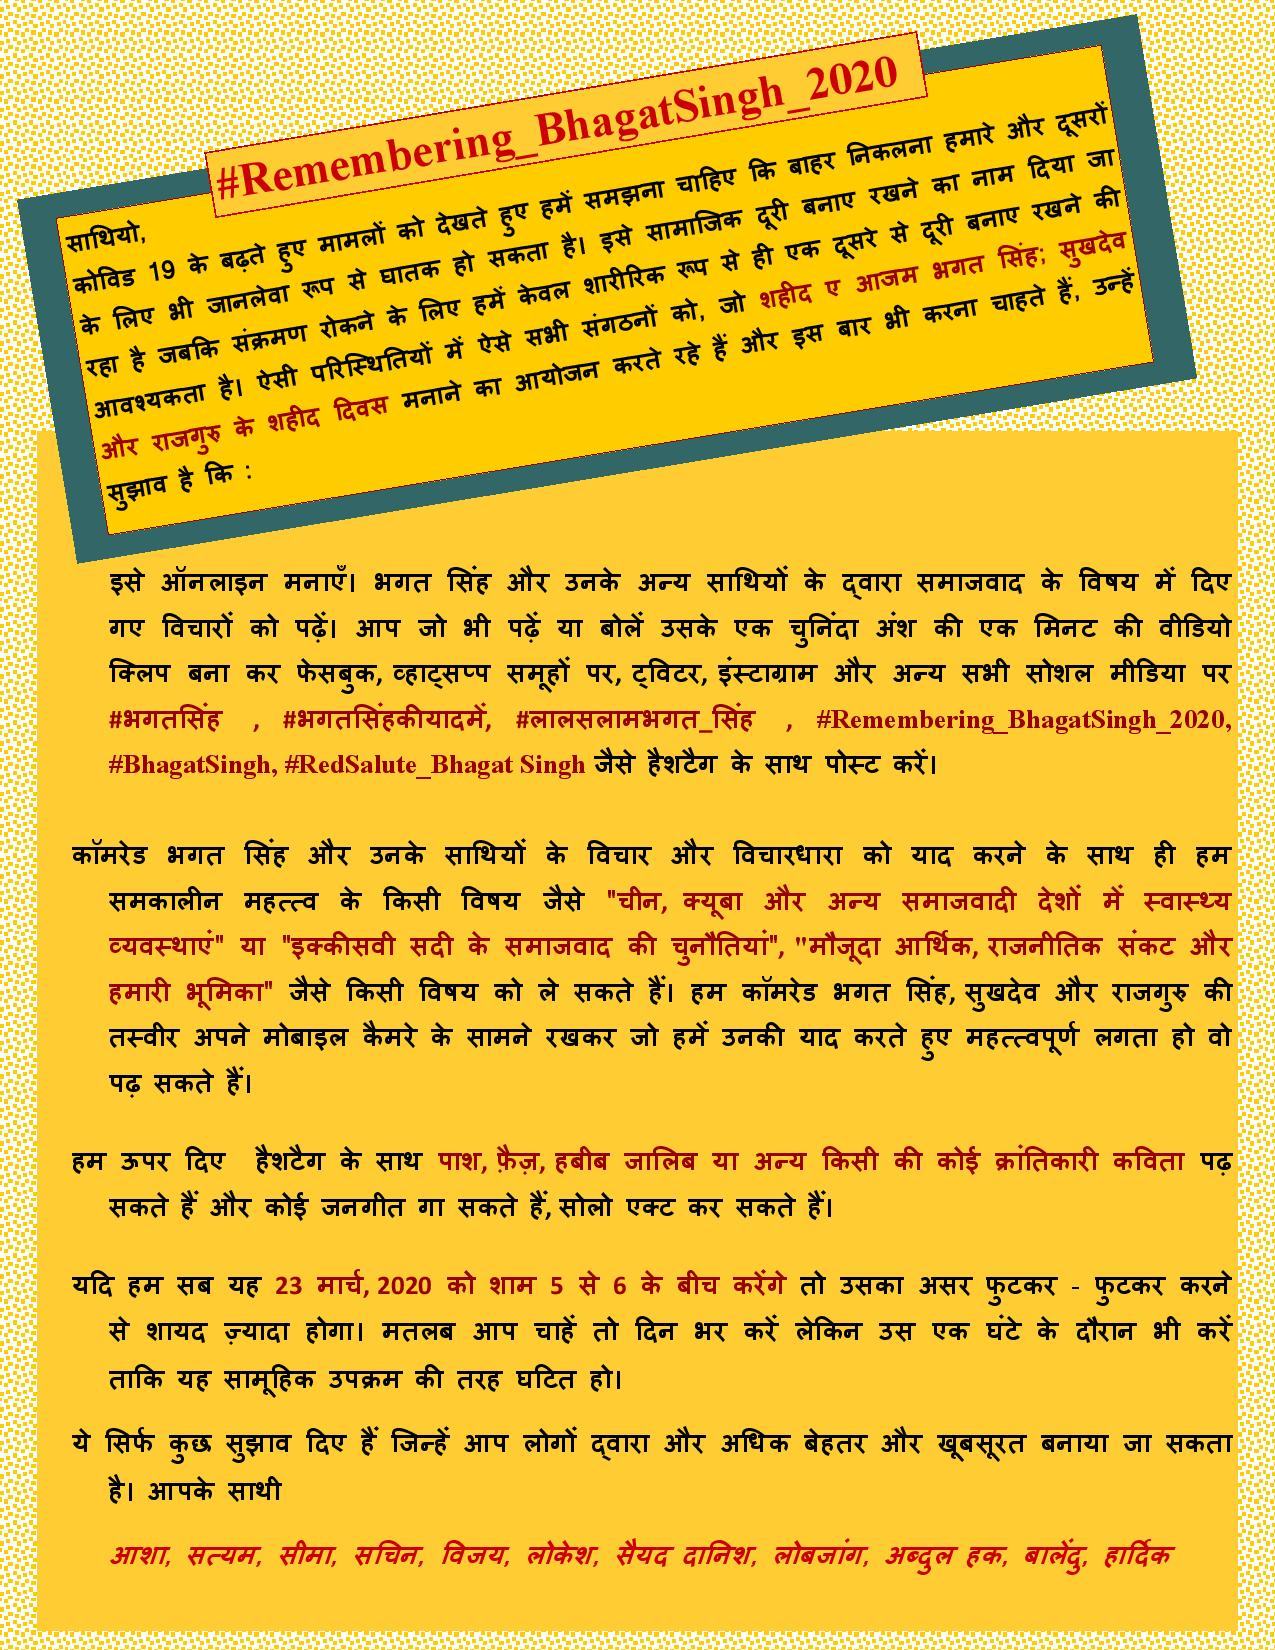 #Remembering_BhagatSingh_2020